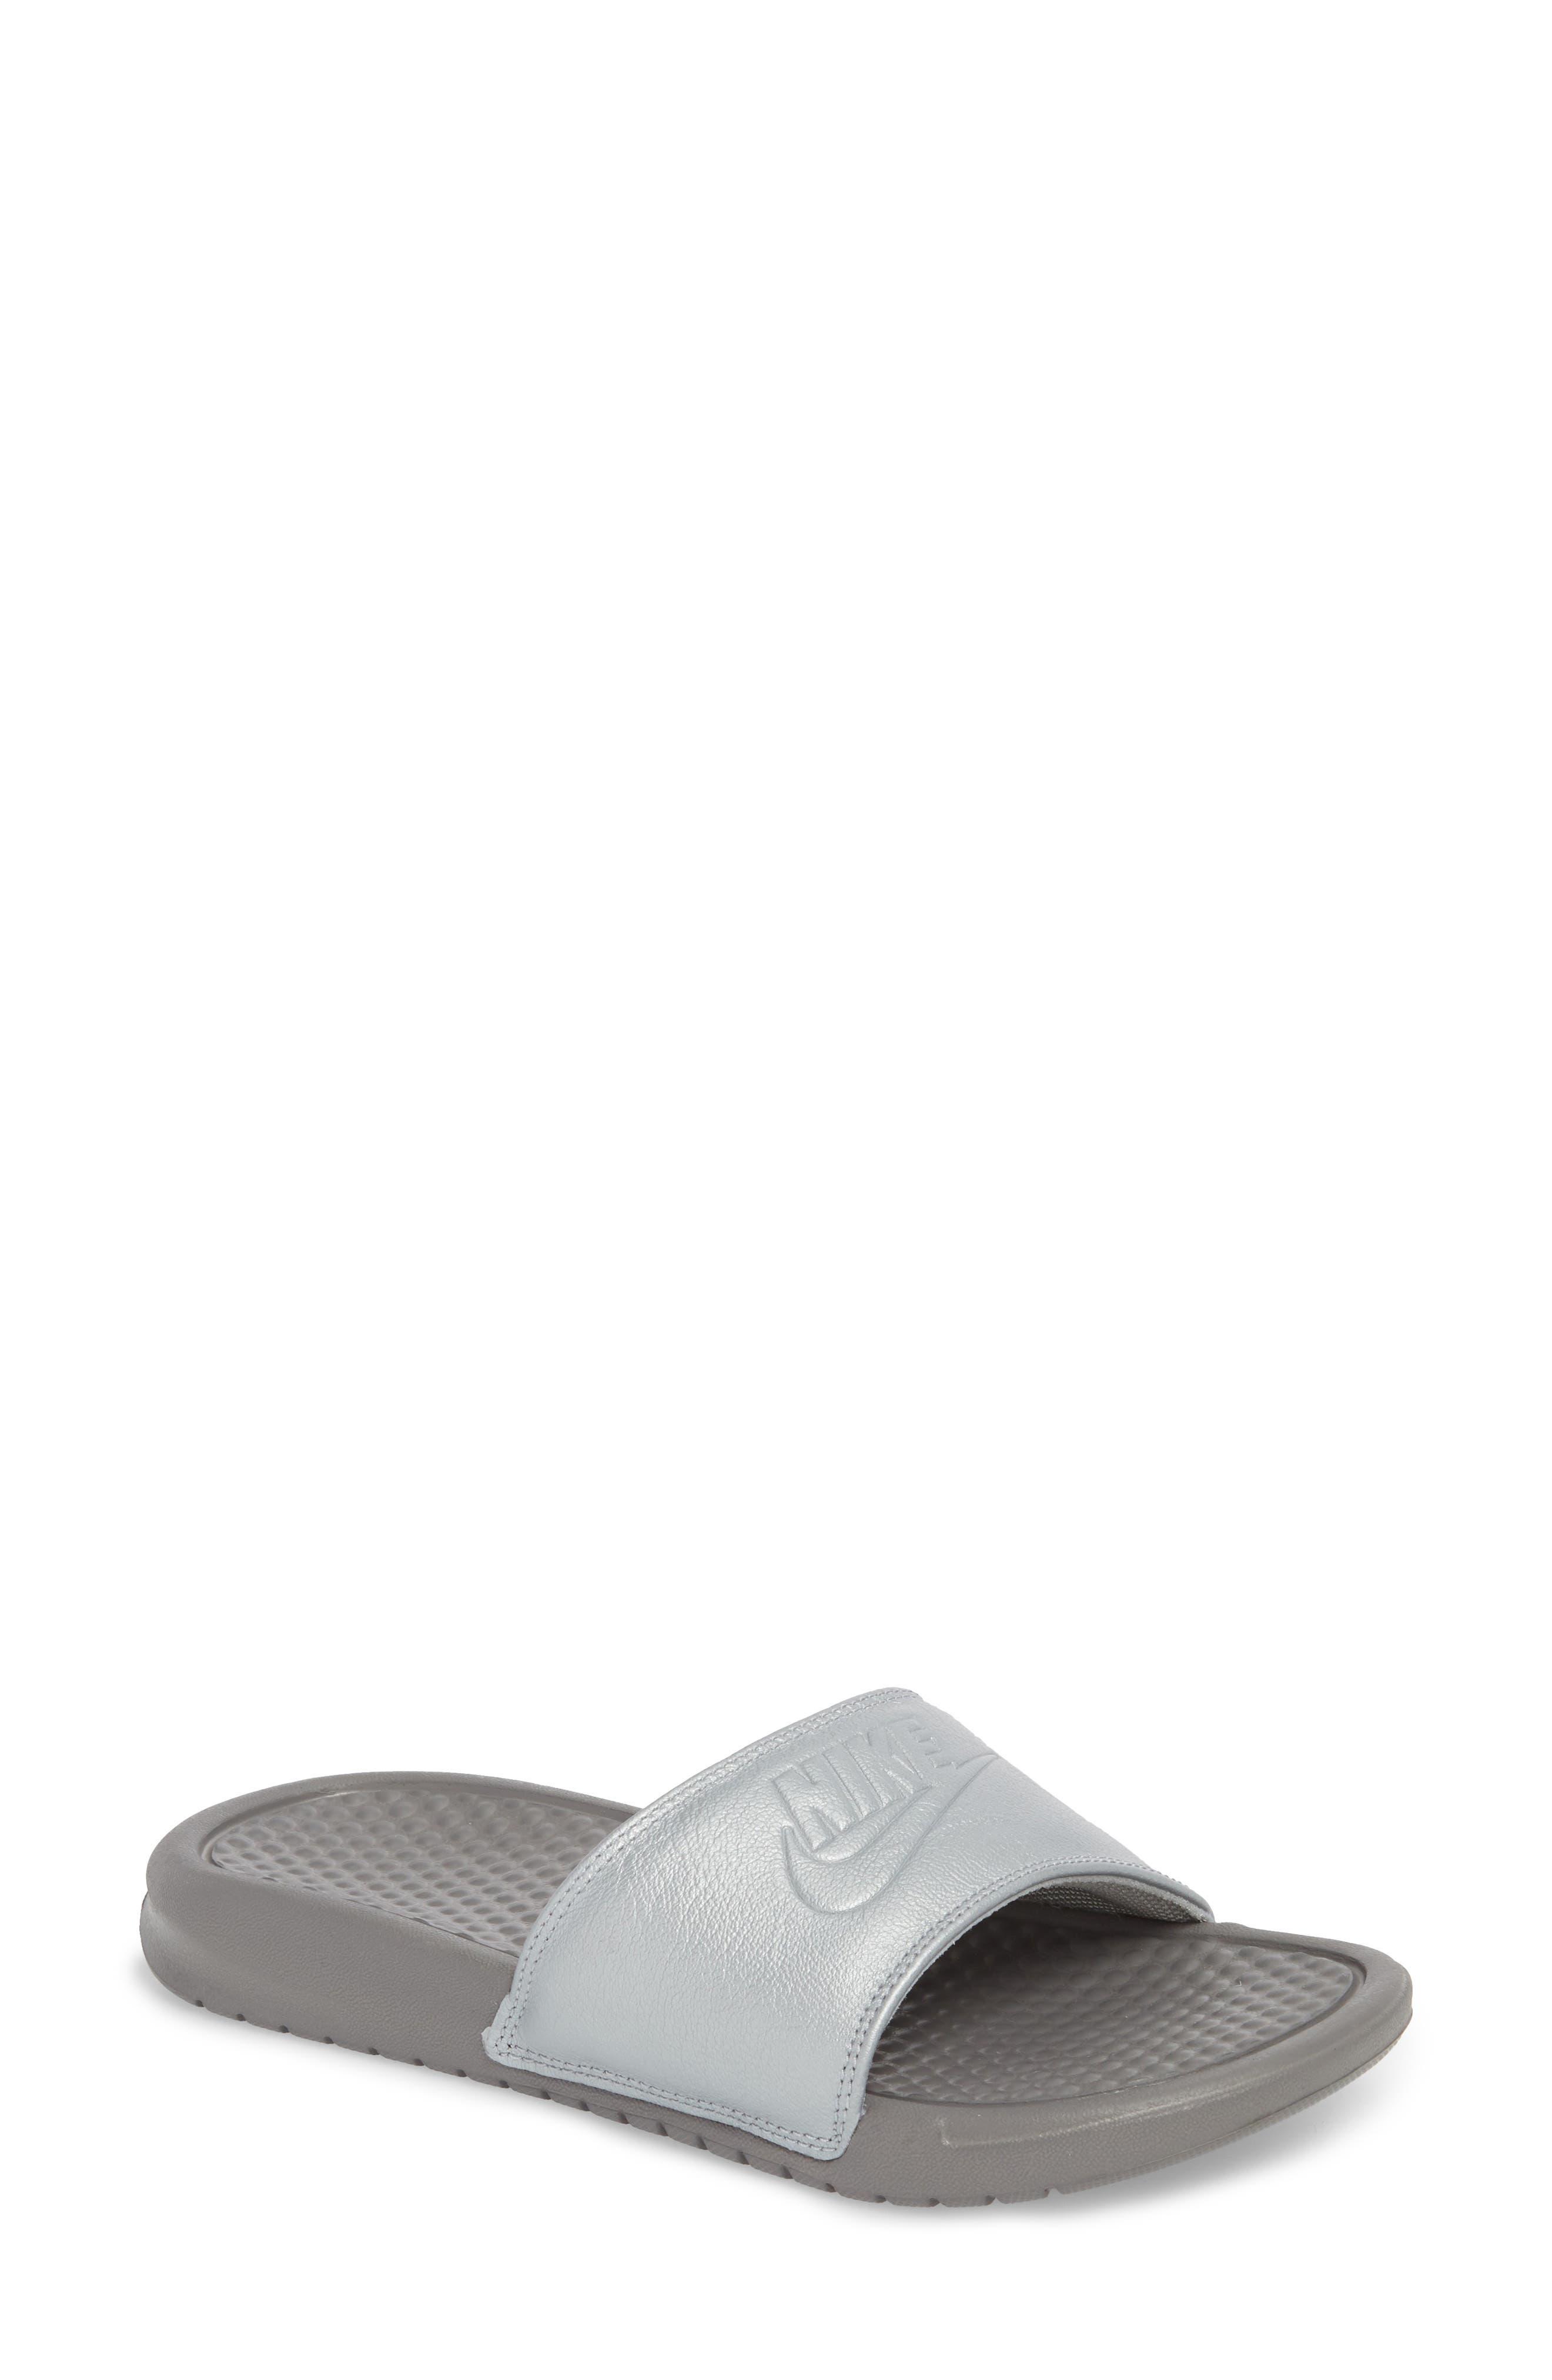 Benassi JDI Sport Slide,                         Main,                         color, Metallic Silver